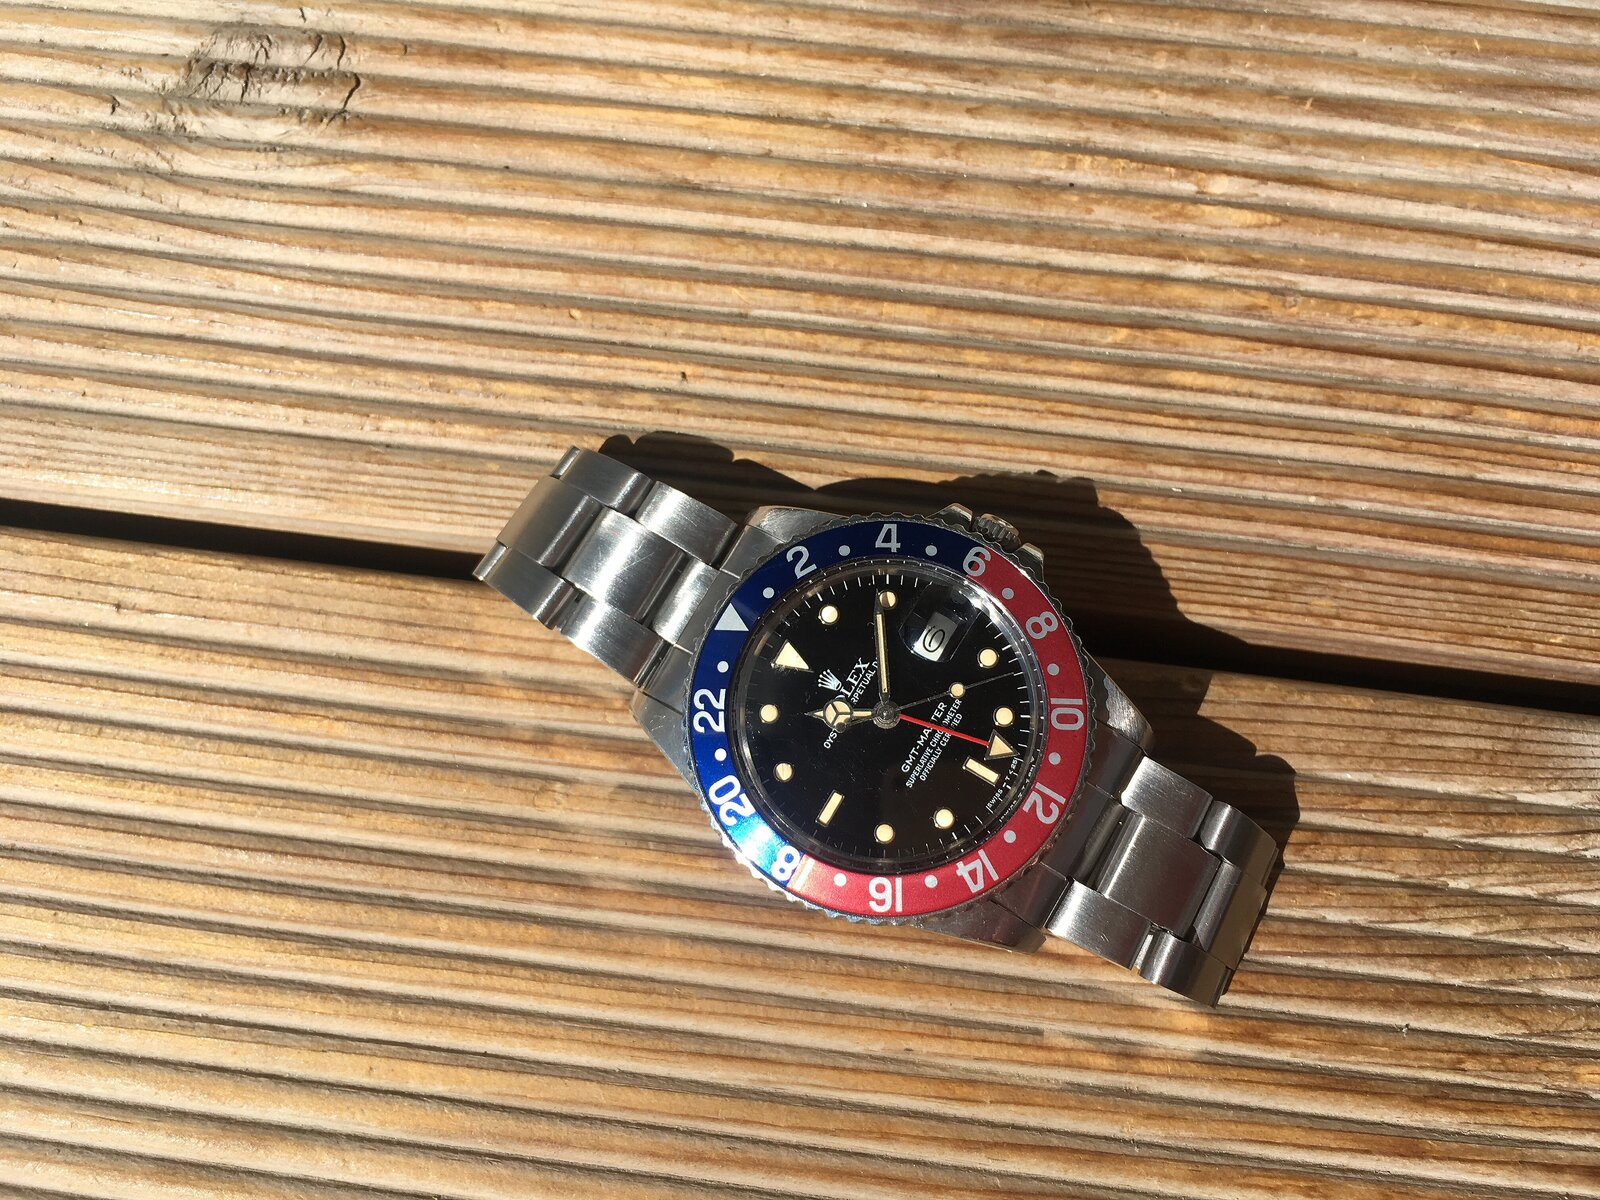 57D3291C-D96C-4FBF-A1AE-09ABDBC52EB2.